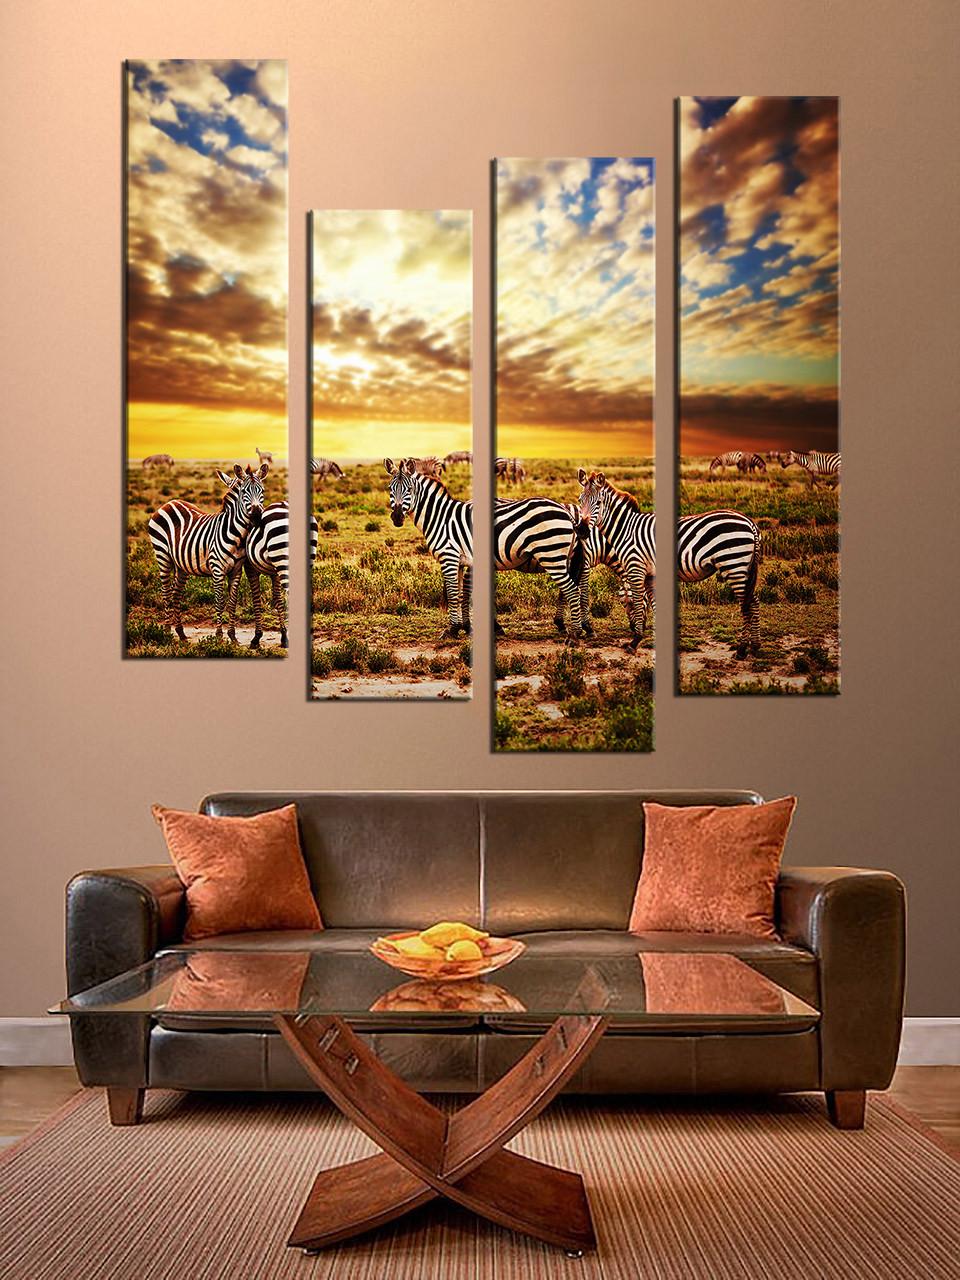 Living Room Decor, 4 Piece Wall Art, Zebra Pictures, Animal Art, Wildlife